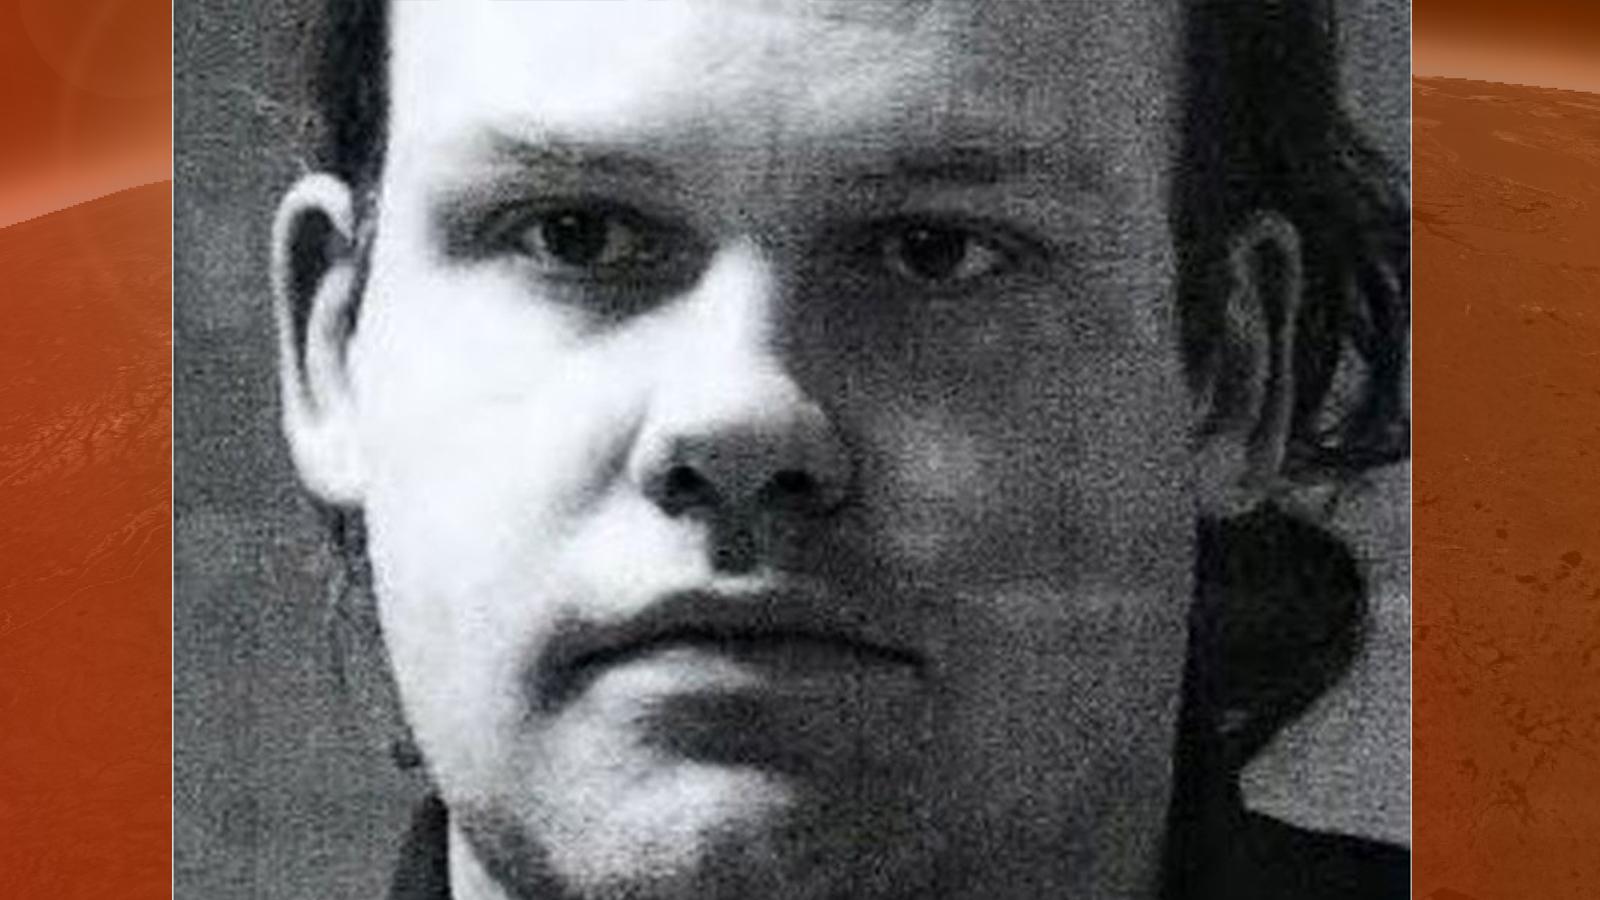 A police handout of Jonathan Karl Bruenig, 34